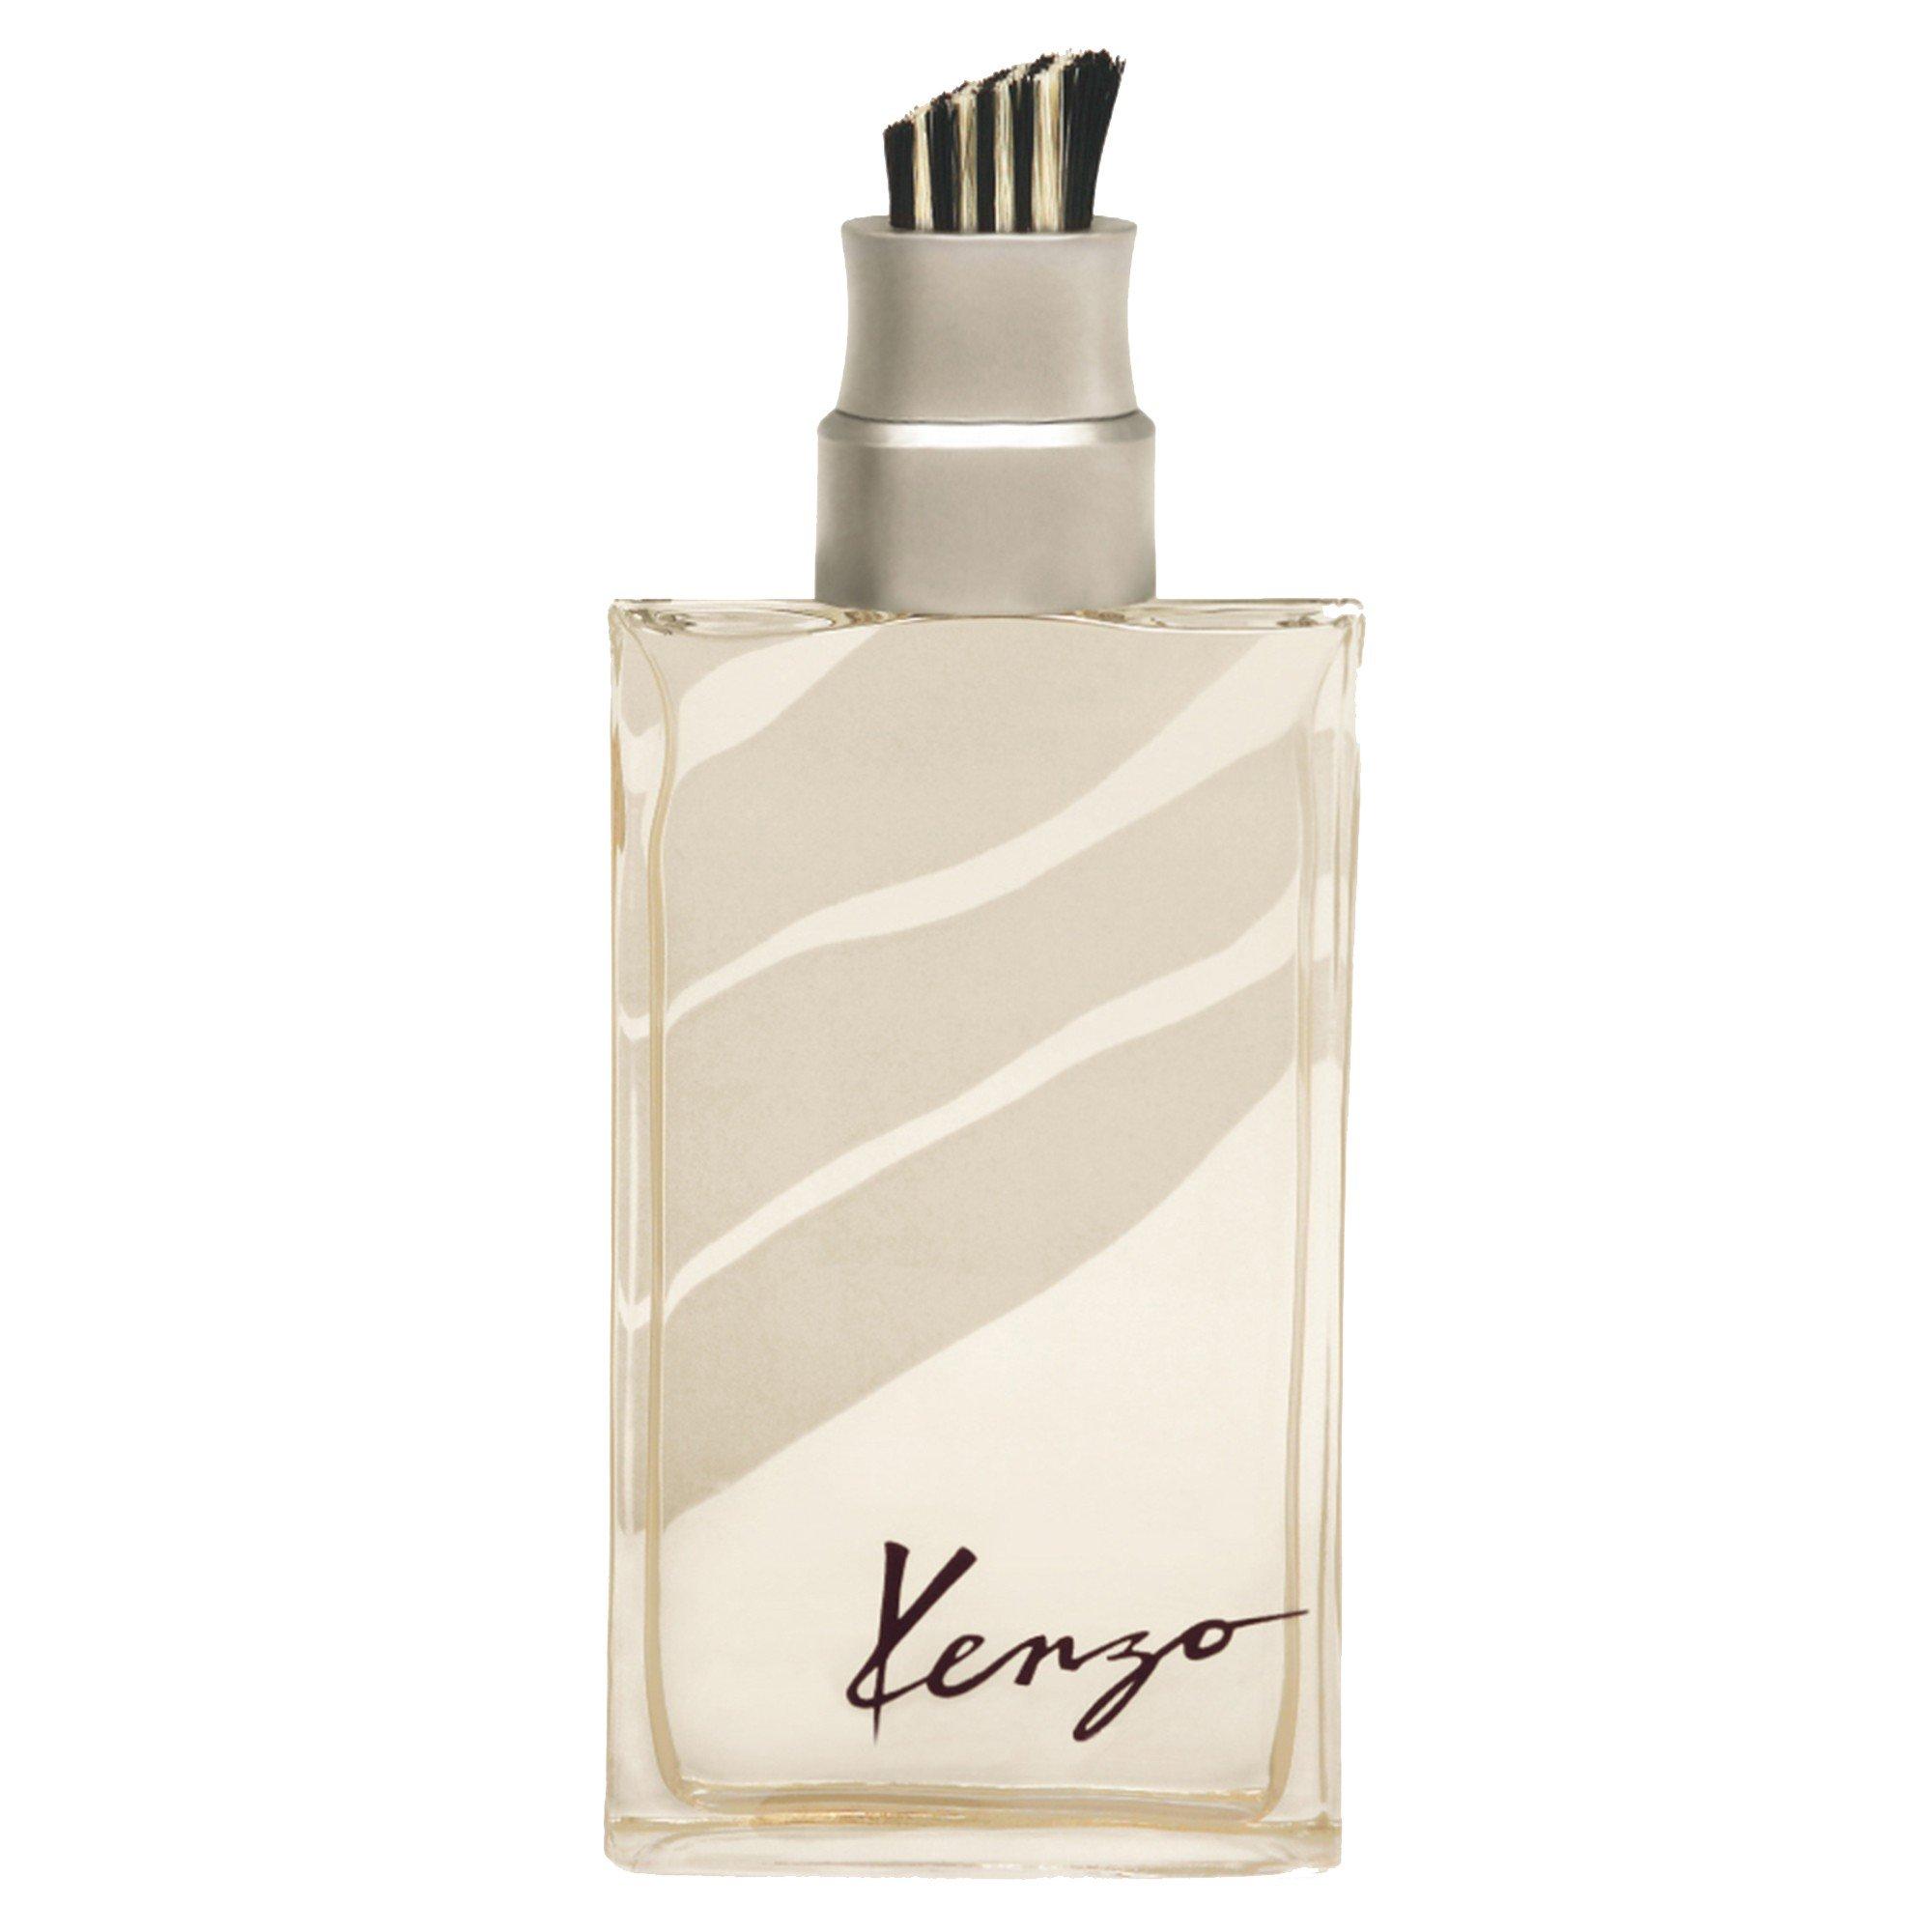 Kenzo - Jungle Homme EDT 100 ml